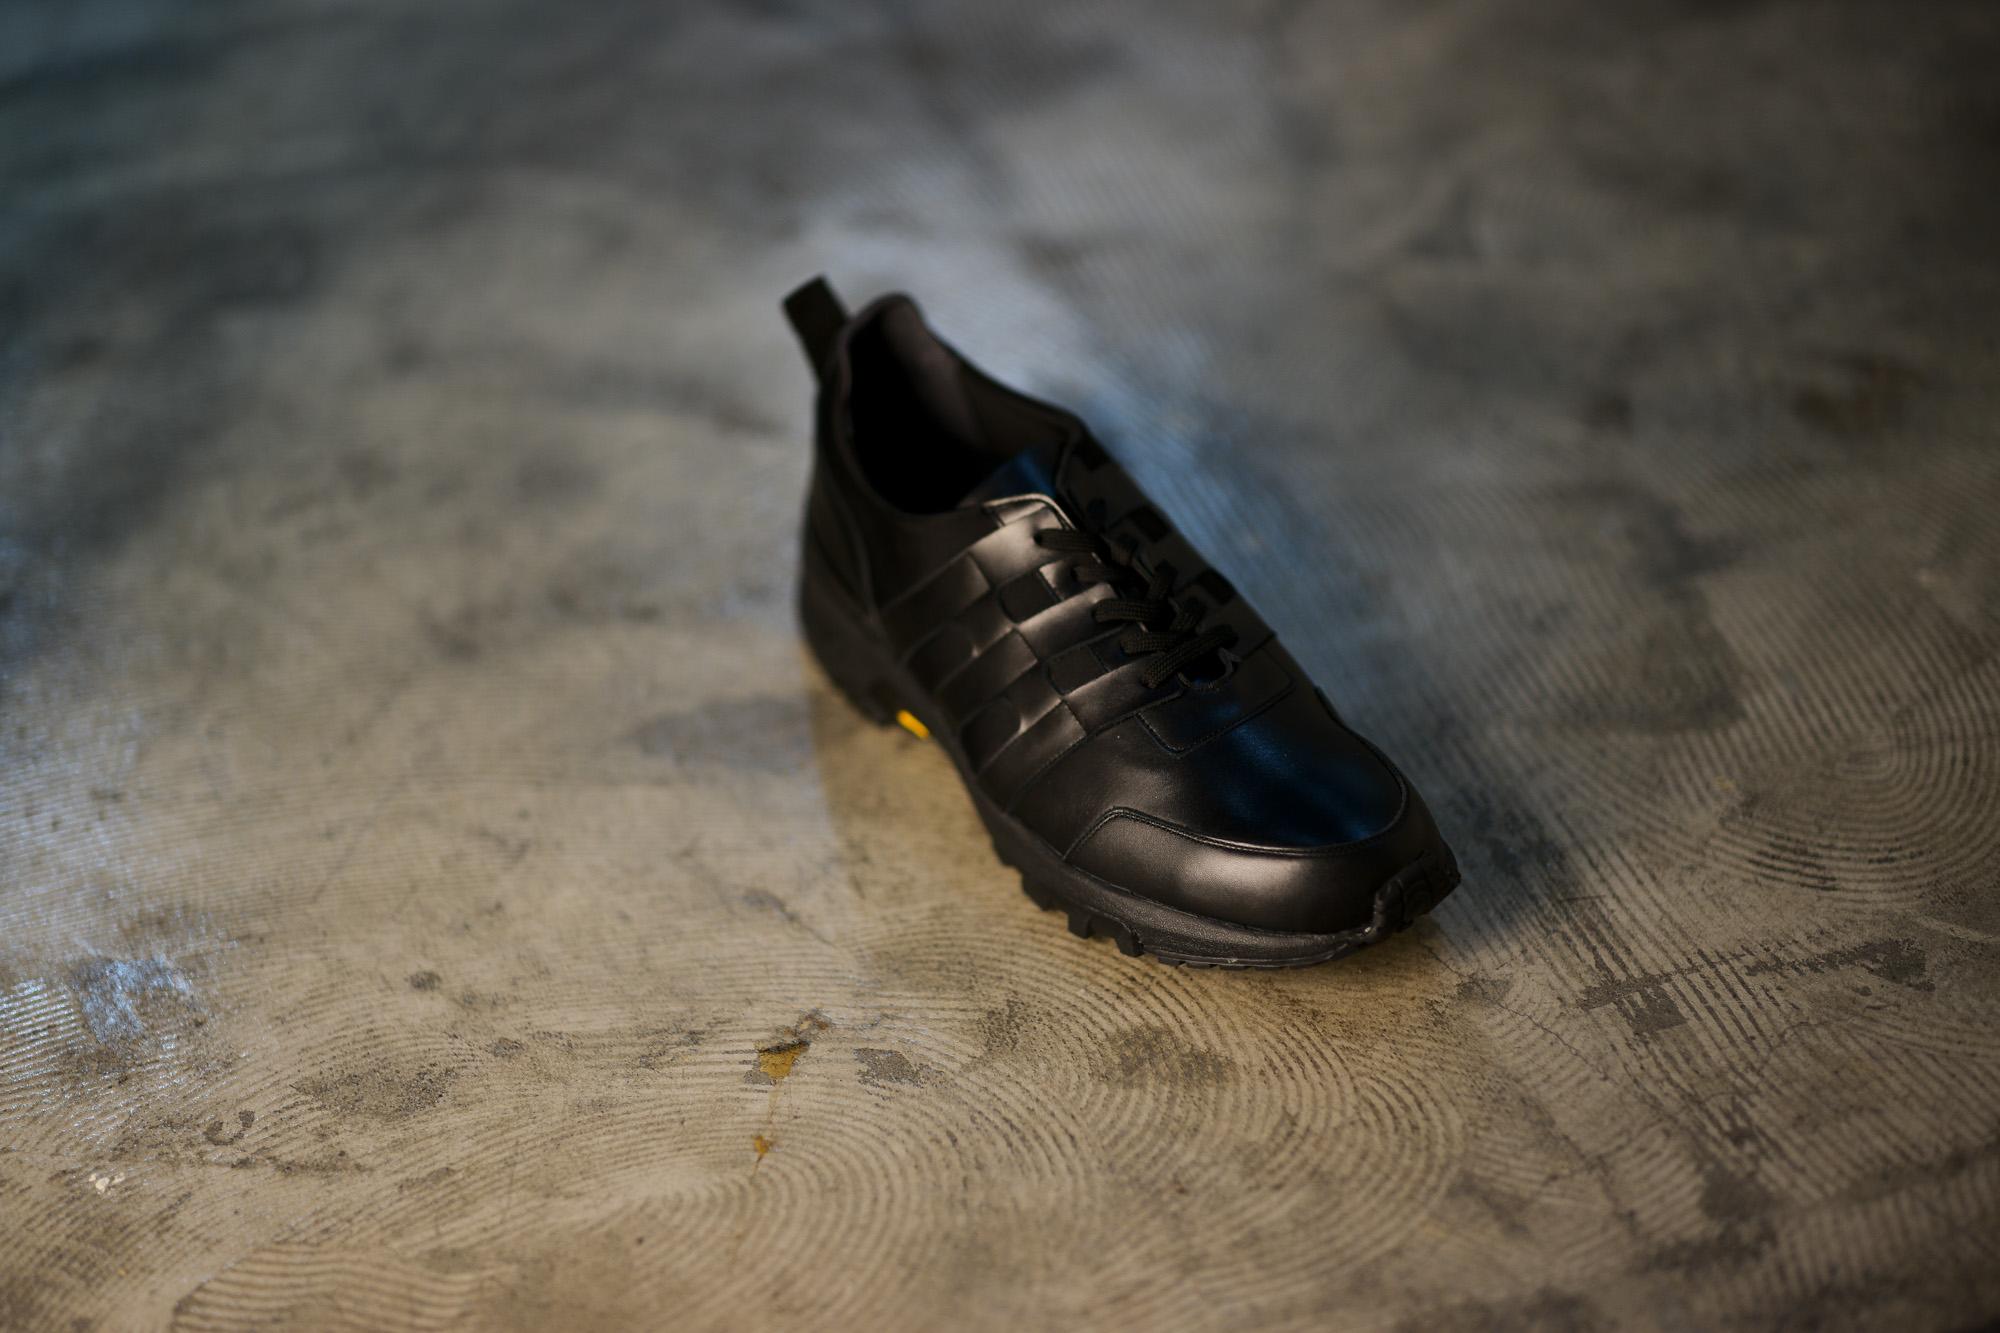 WH (ダブルエイチ) WH-0111 Faster Last(ファスターラスト) Sneakers スニーカー BLACK×BLACK (ブラック×ブラック) MADE IN JAPAN (日本製) 2019 秋冬【ご予約受付開始】 愛知 名古屋 alto e diritto altoediritto アルトエデリット